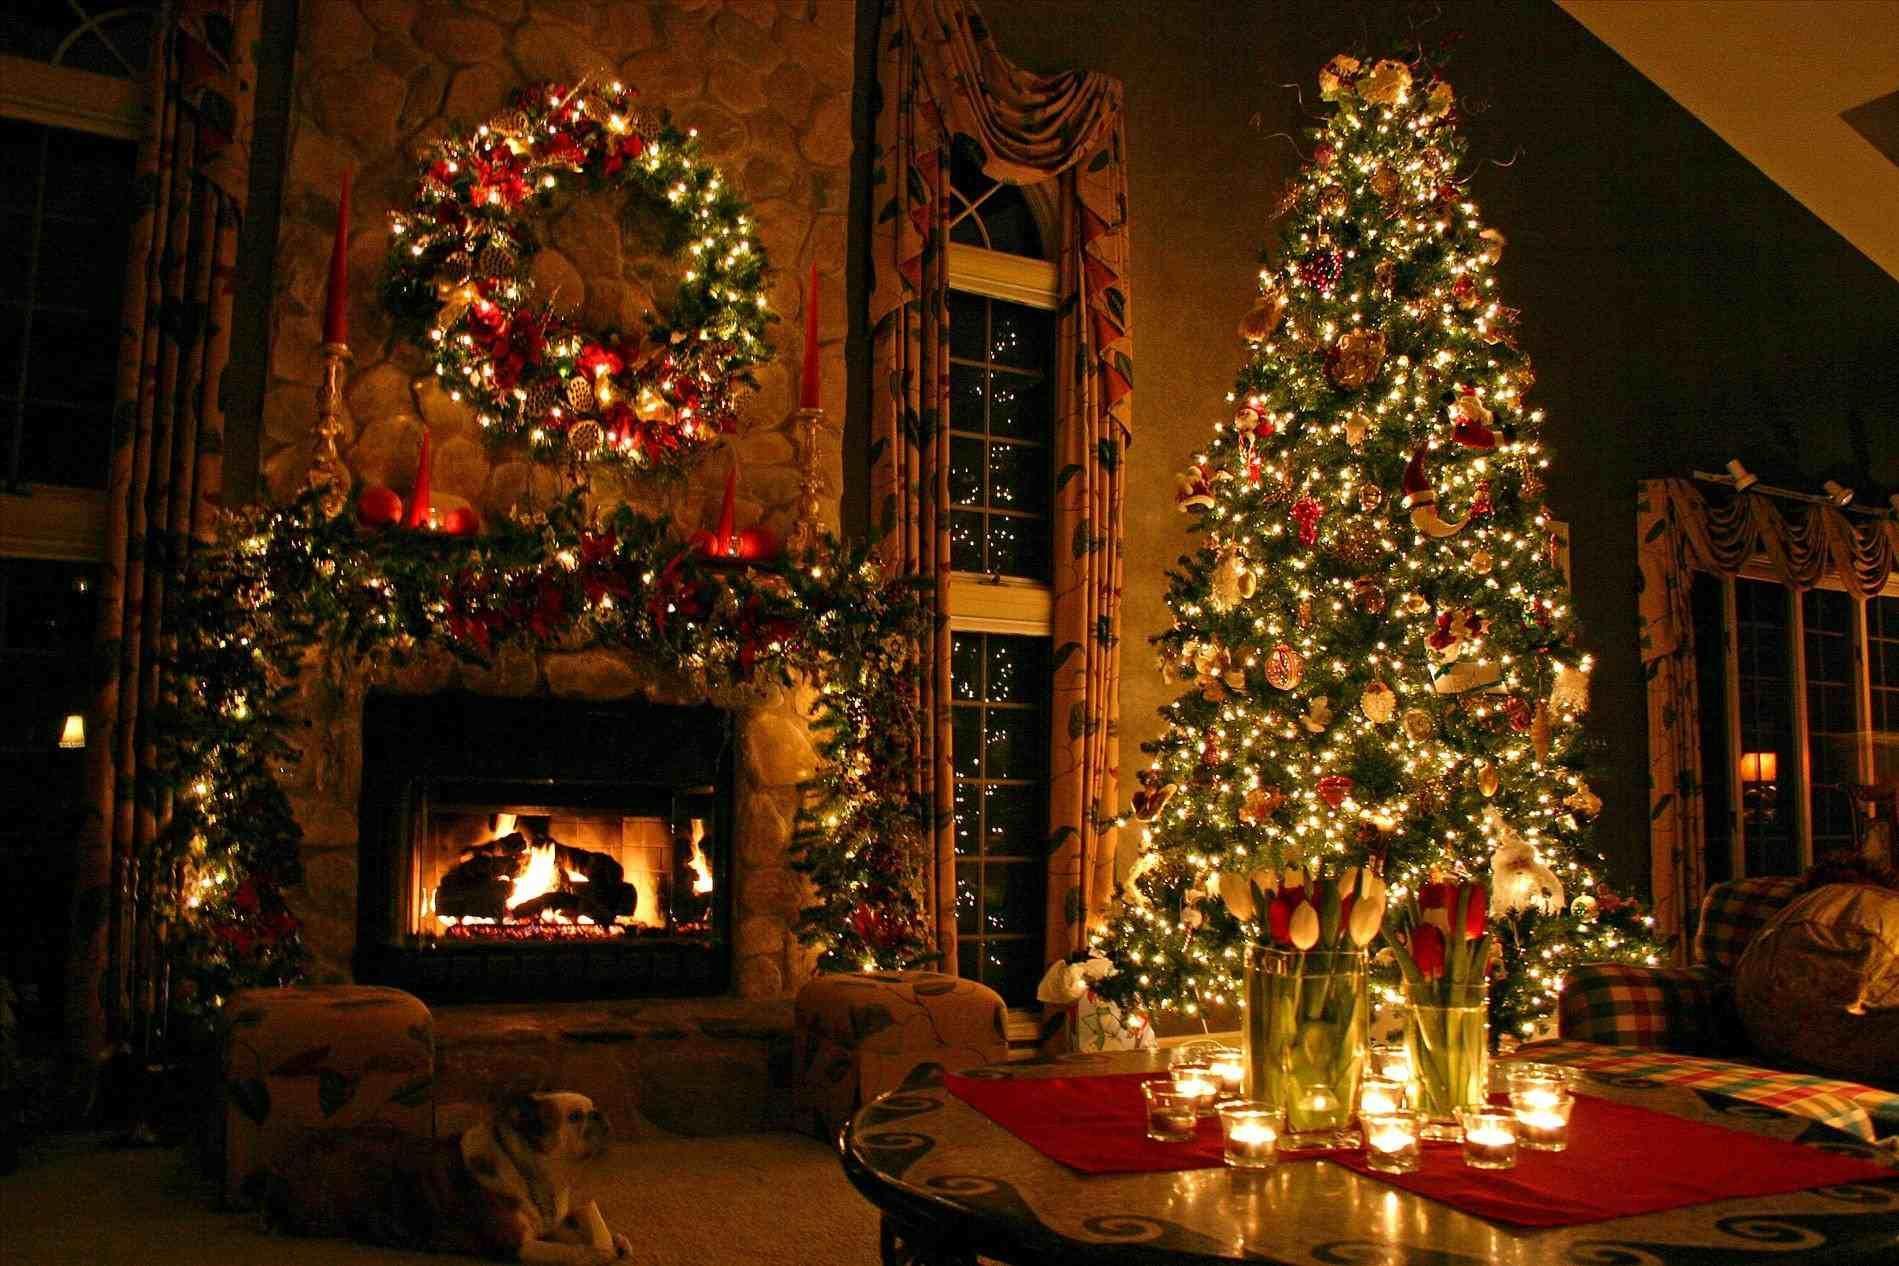 New Post Christmas Tree Wallpaper Backgrounds 2016 Interesting Visit Xmastsite